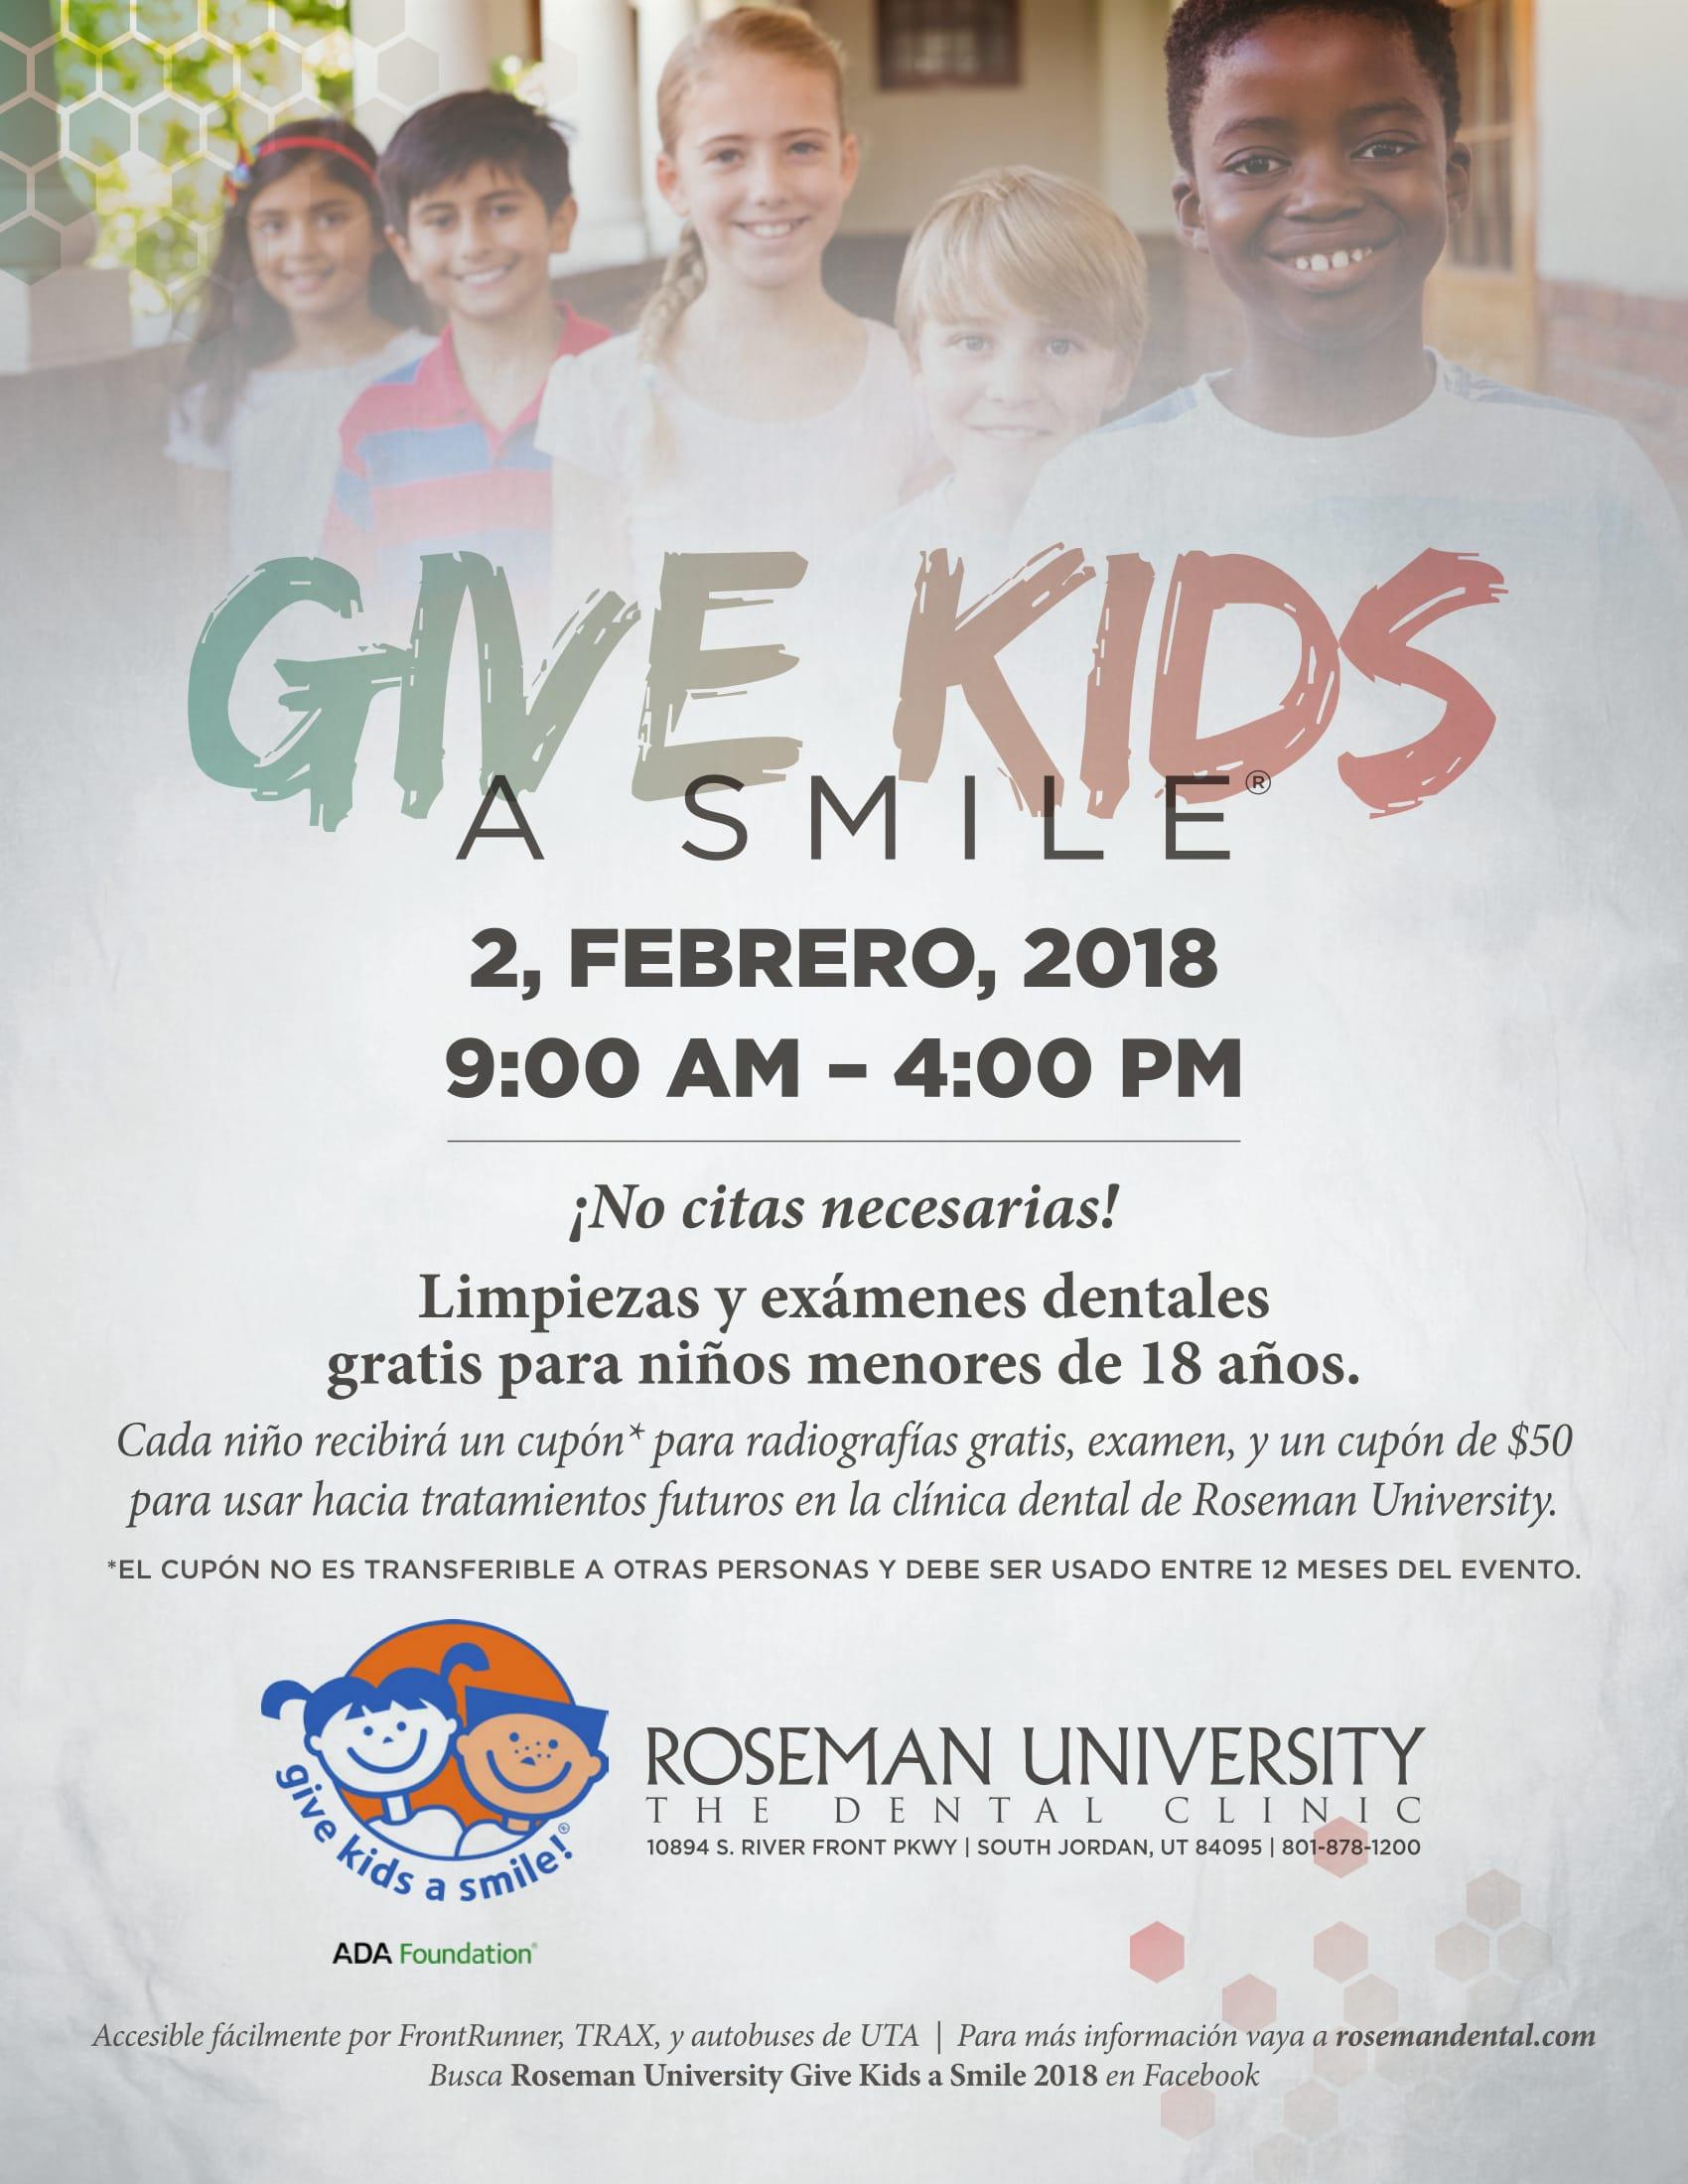 Roseman_GiveKidsASmile_2018-flyer-1-2.jpg